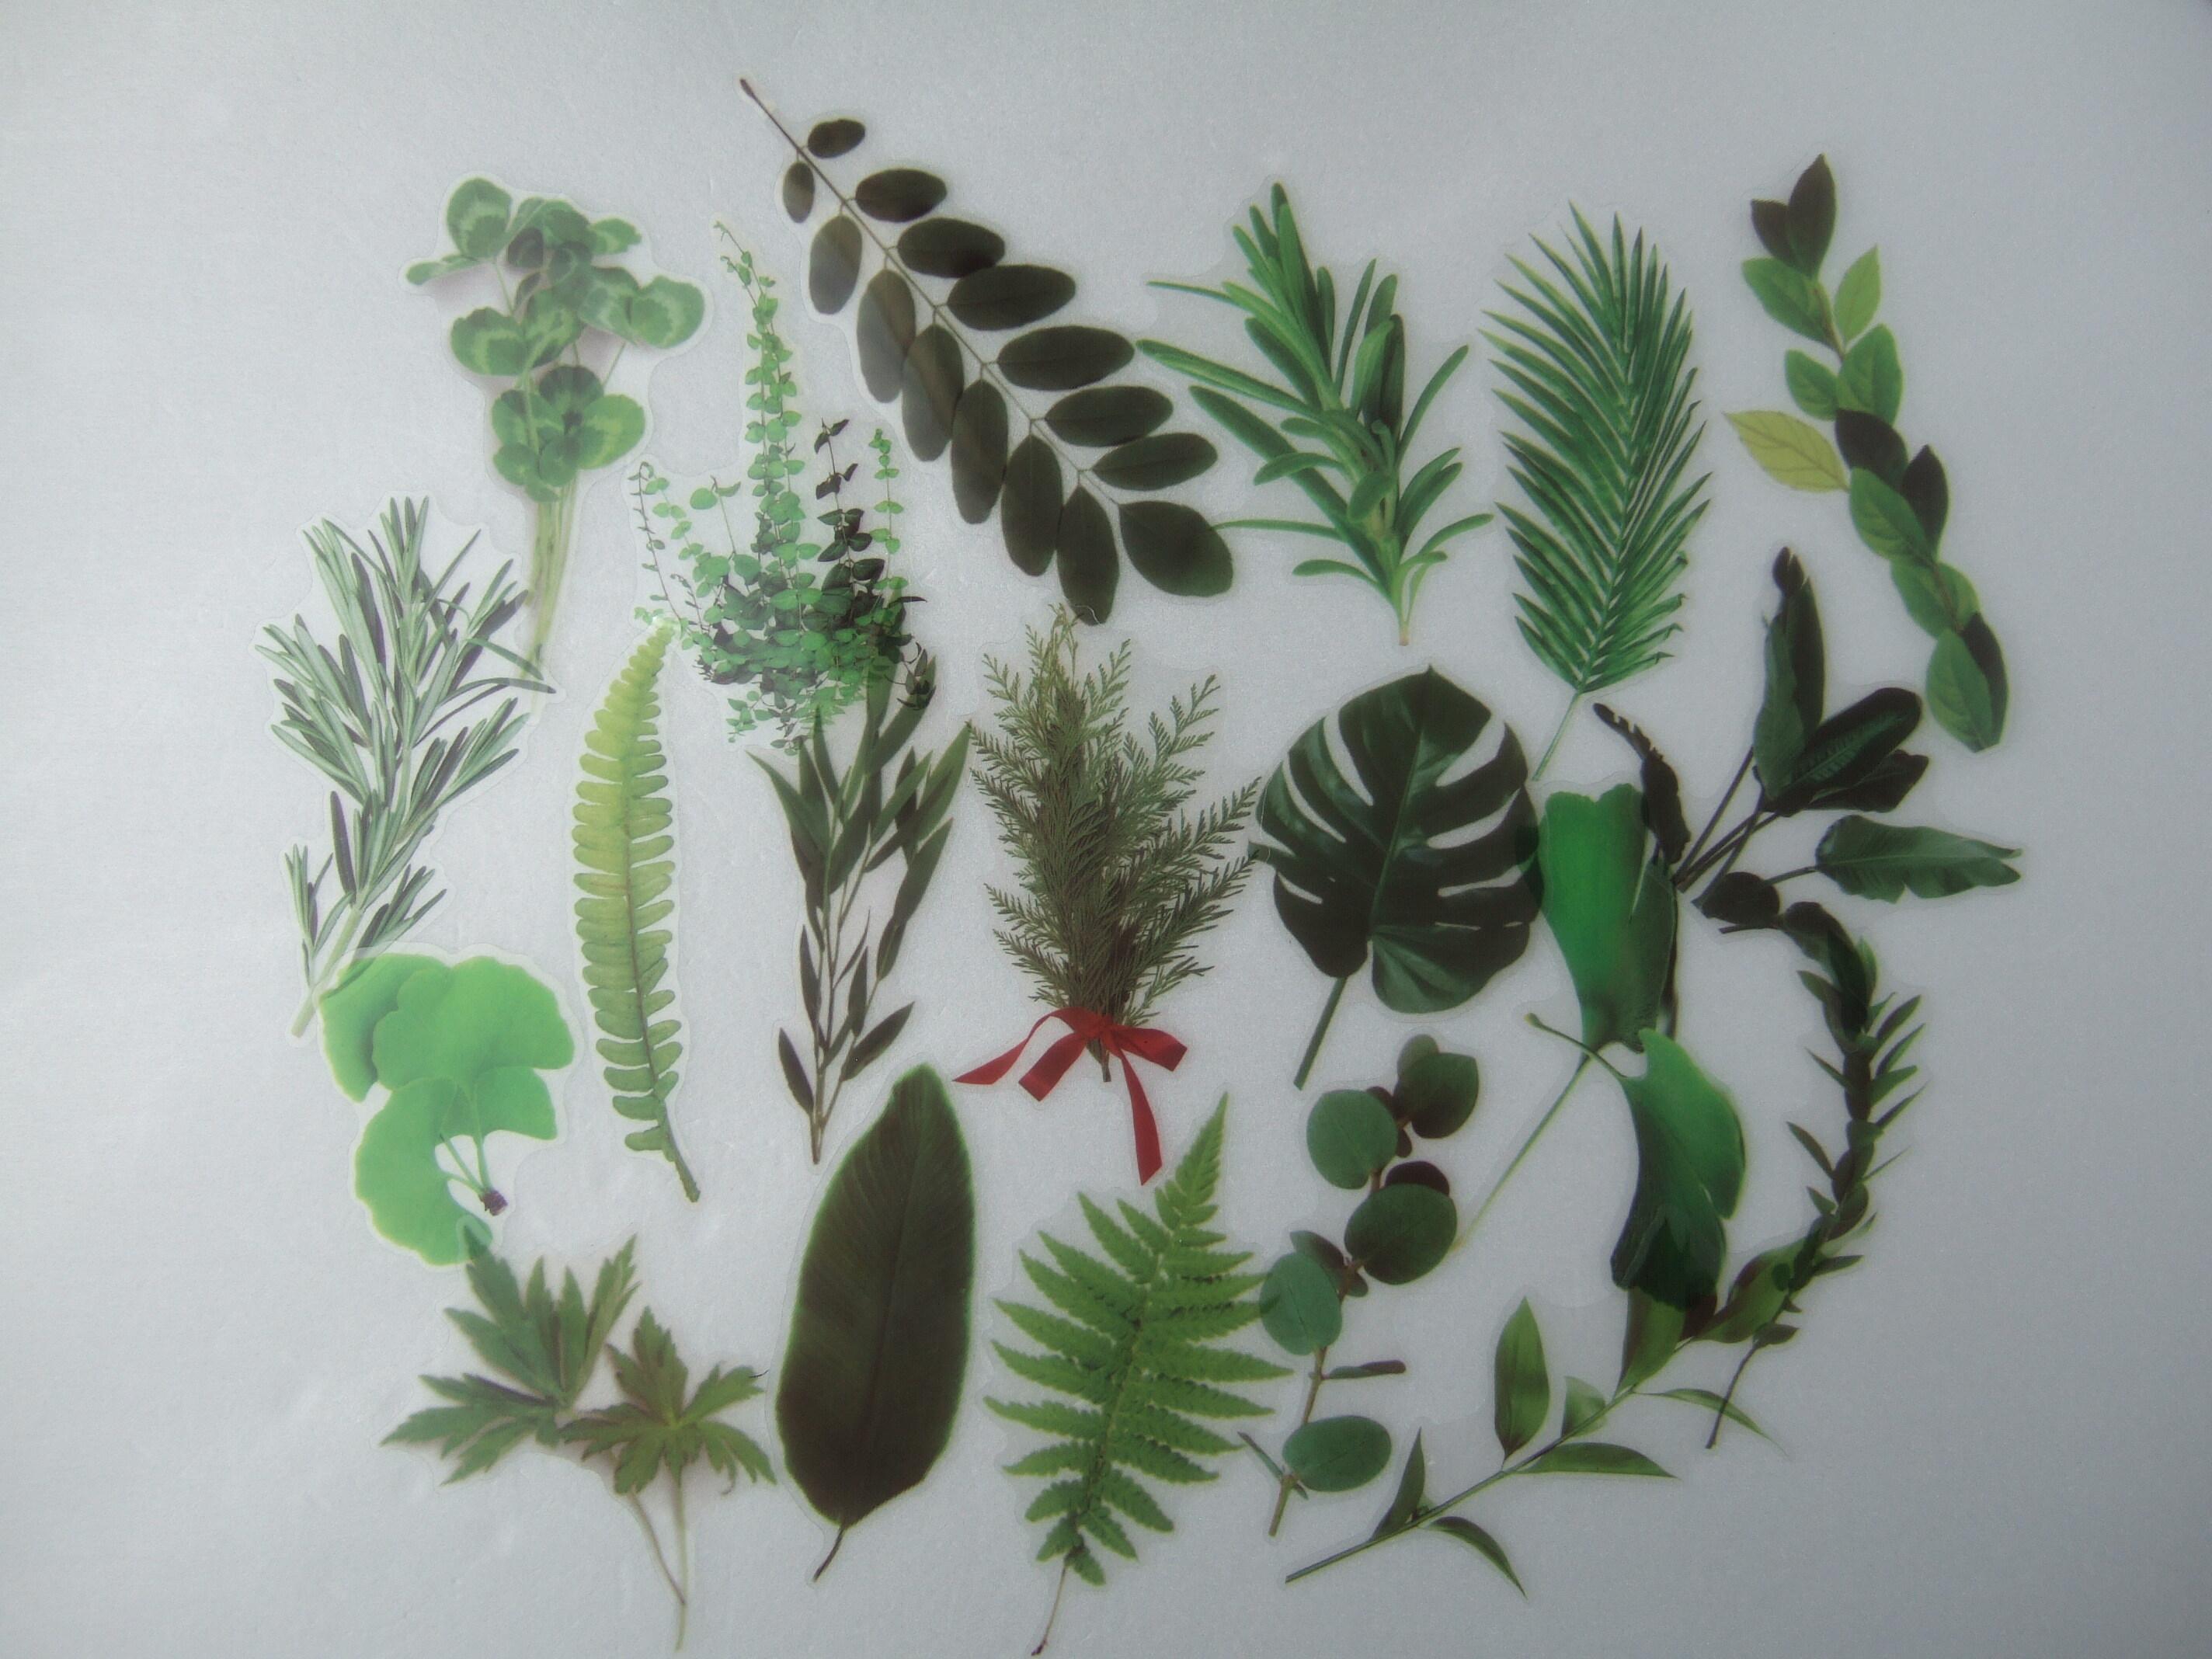 PET素材 シール 全6種 ボタニカル 素材 海外 花 植物 透明 ステッカー A32